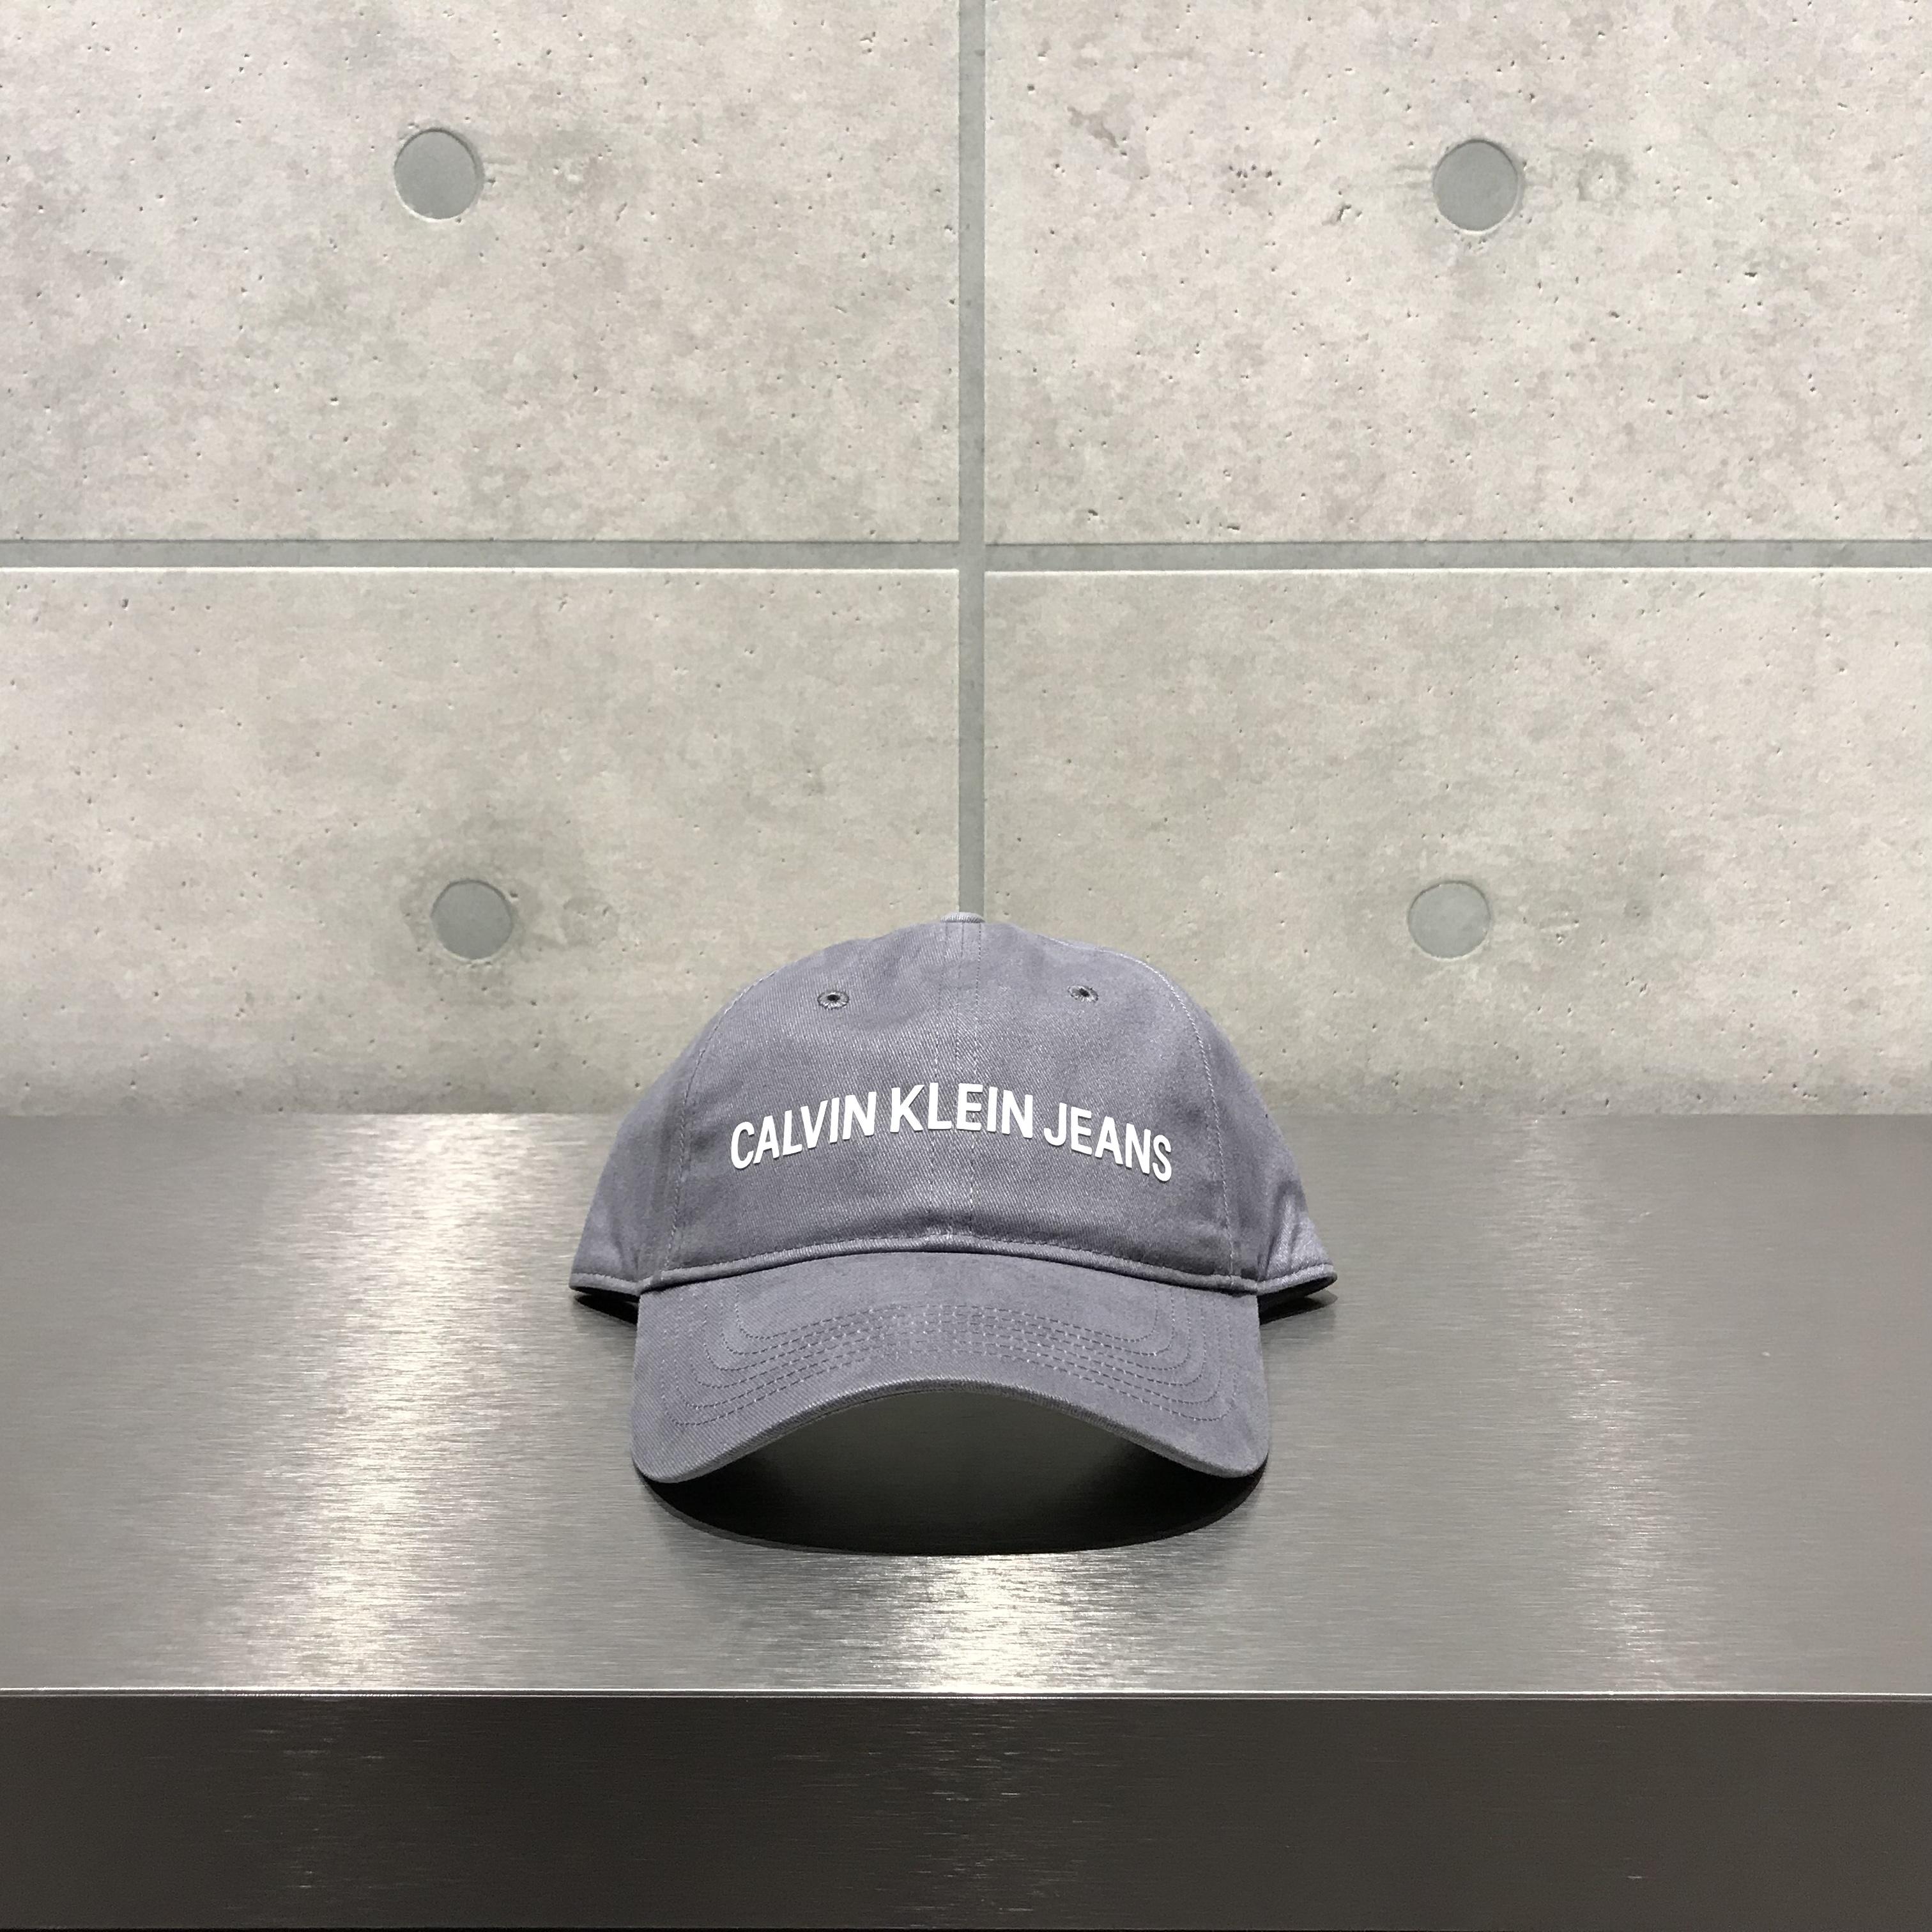 Calvin Klein LOGO 6-PANEL CAP / GRAY x WHITE